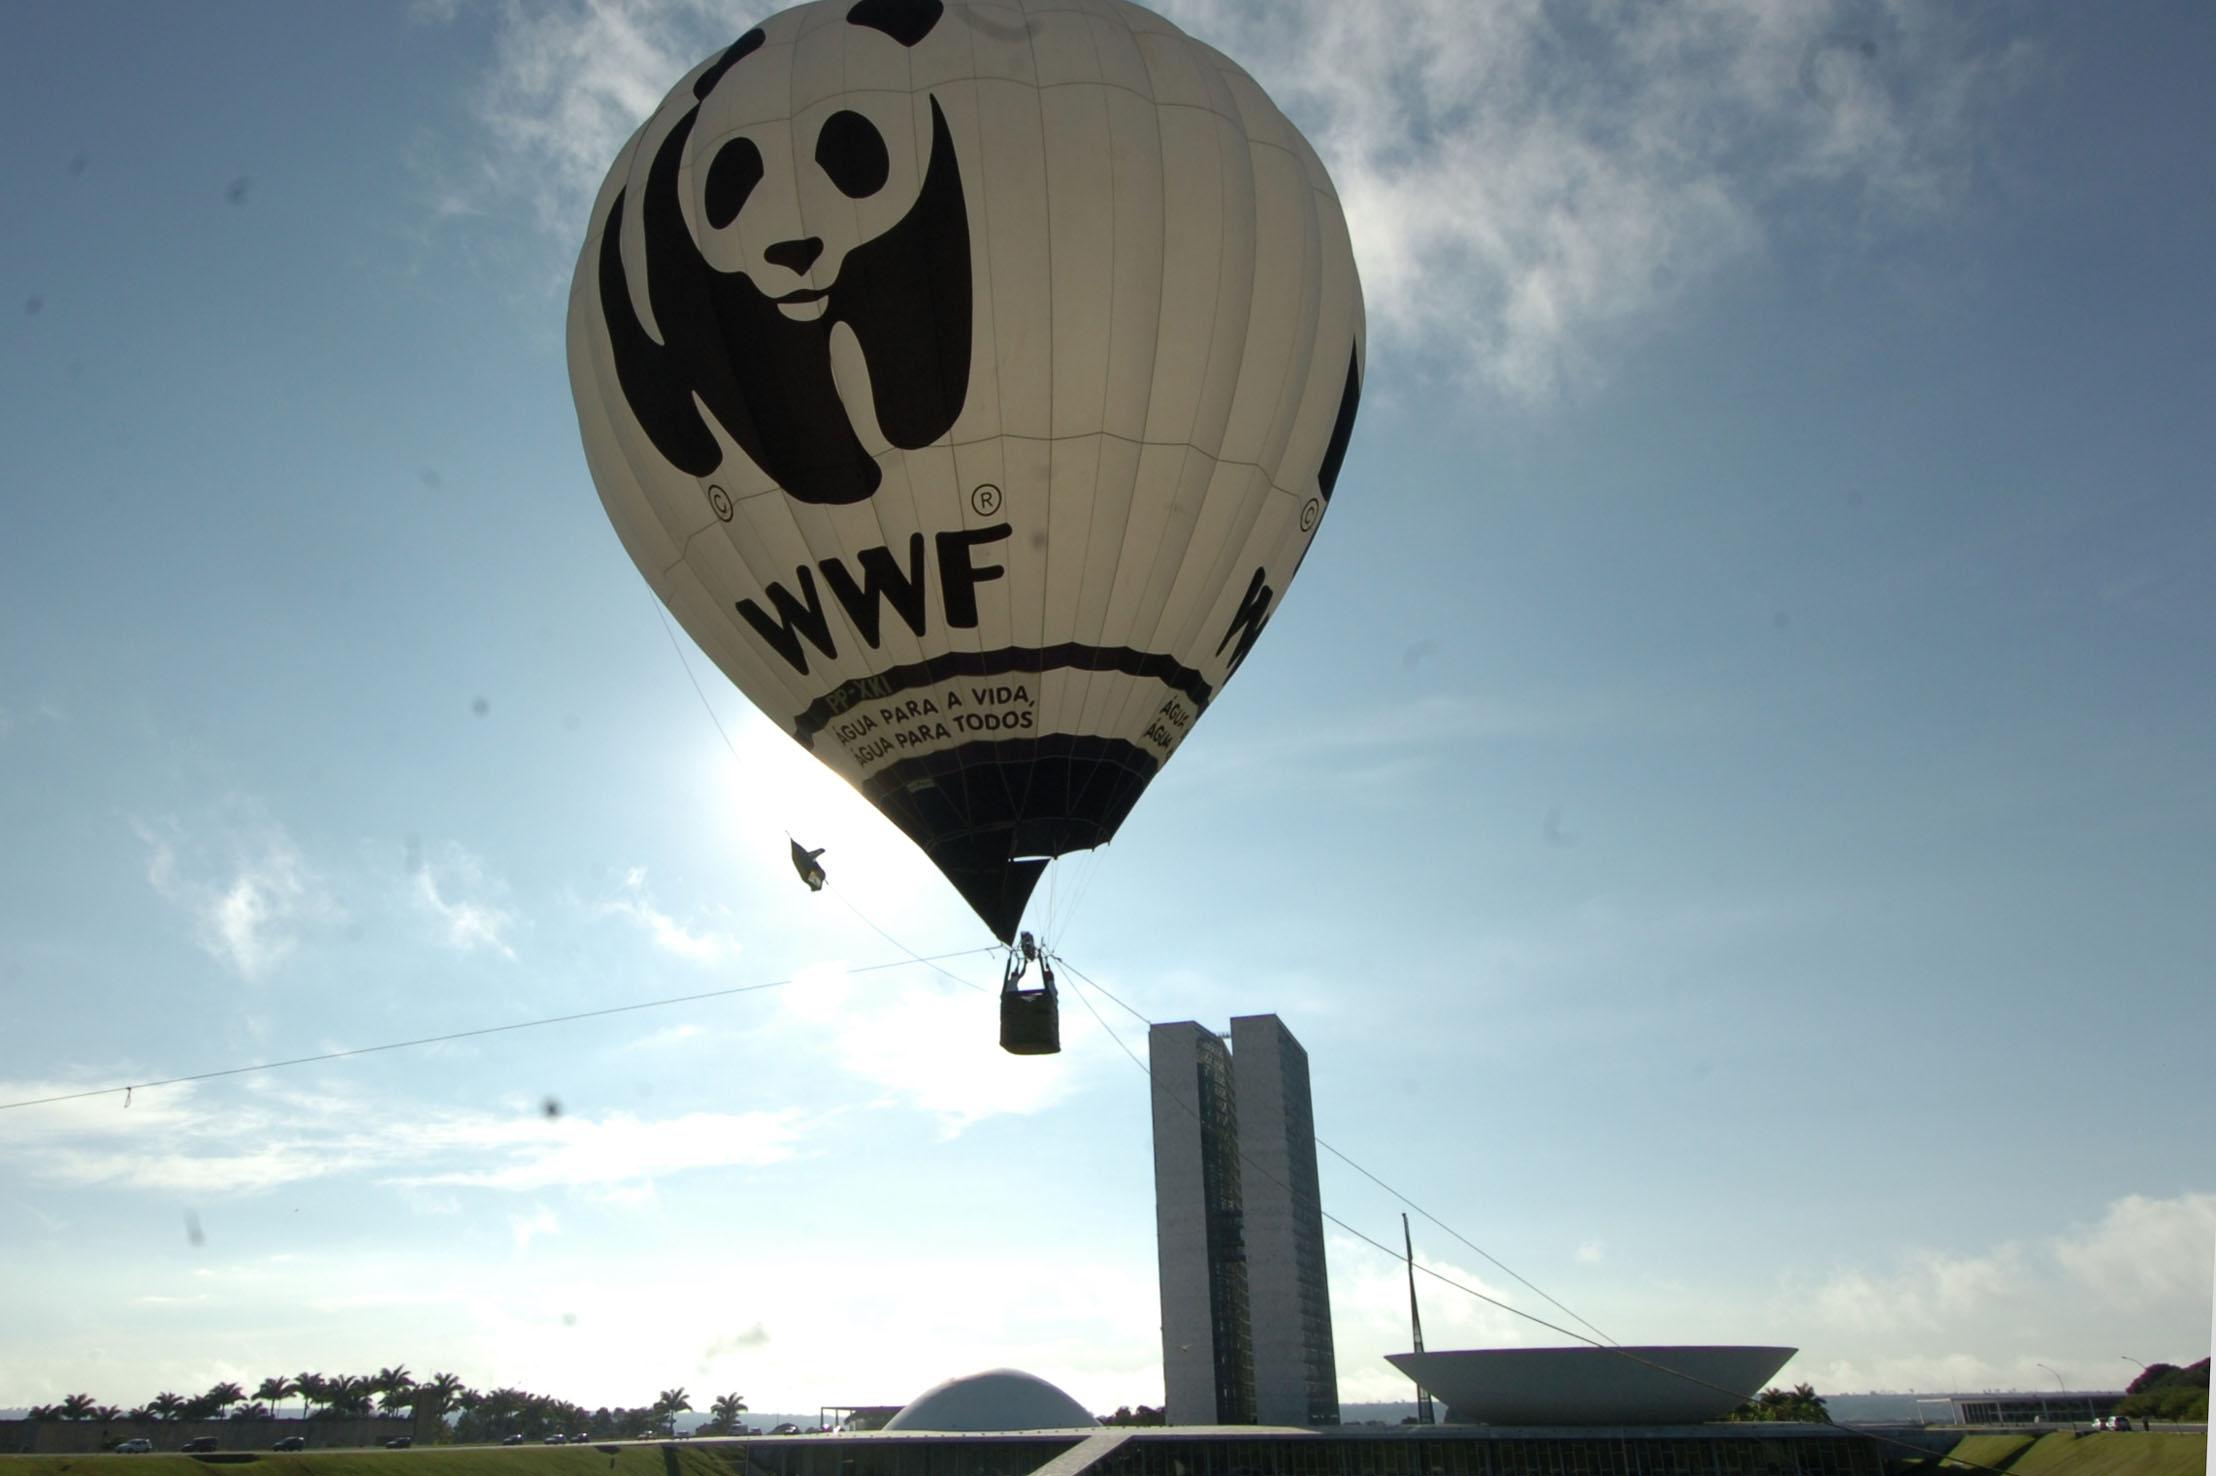 WWF baloon.jpg